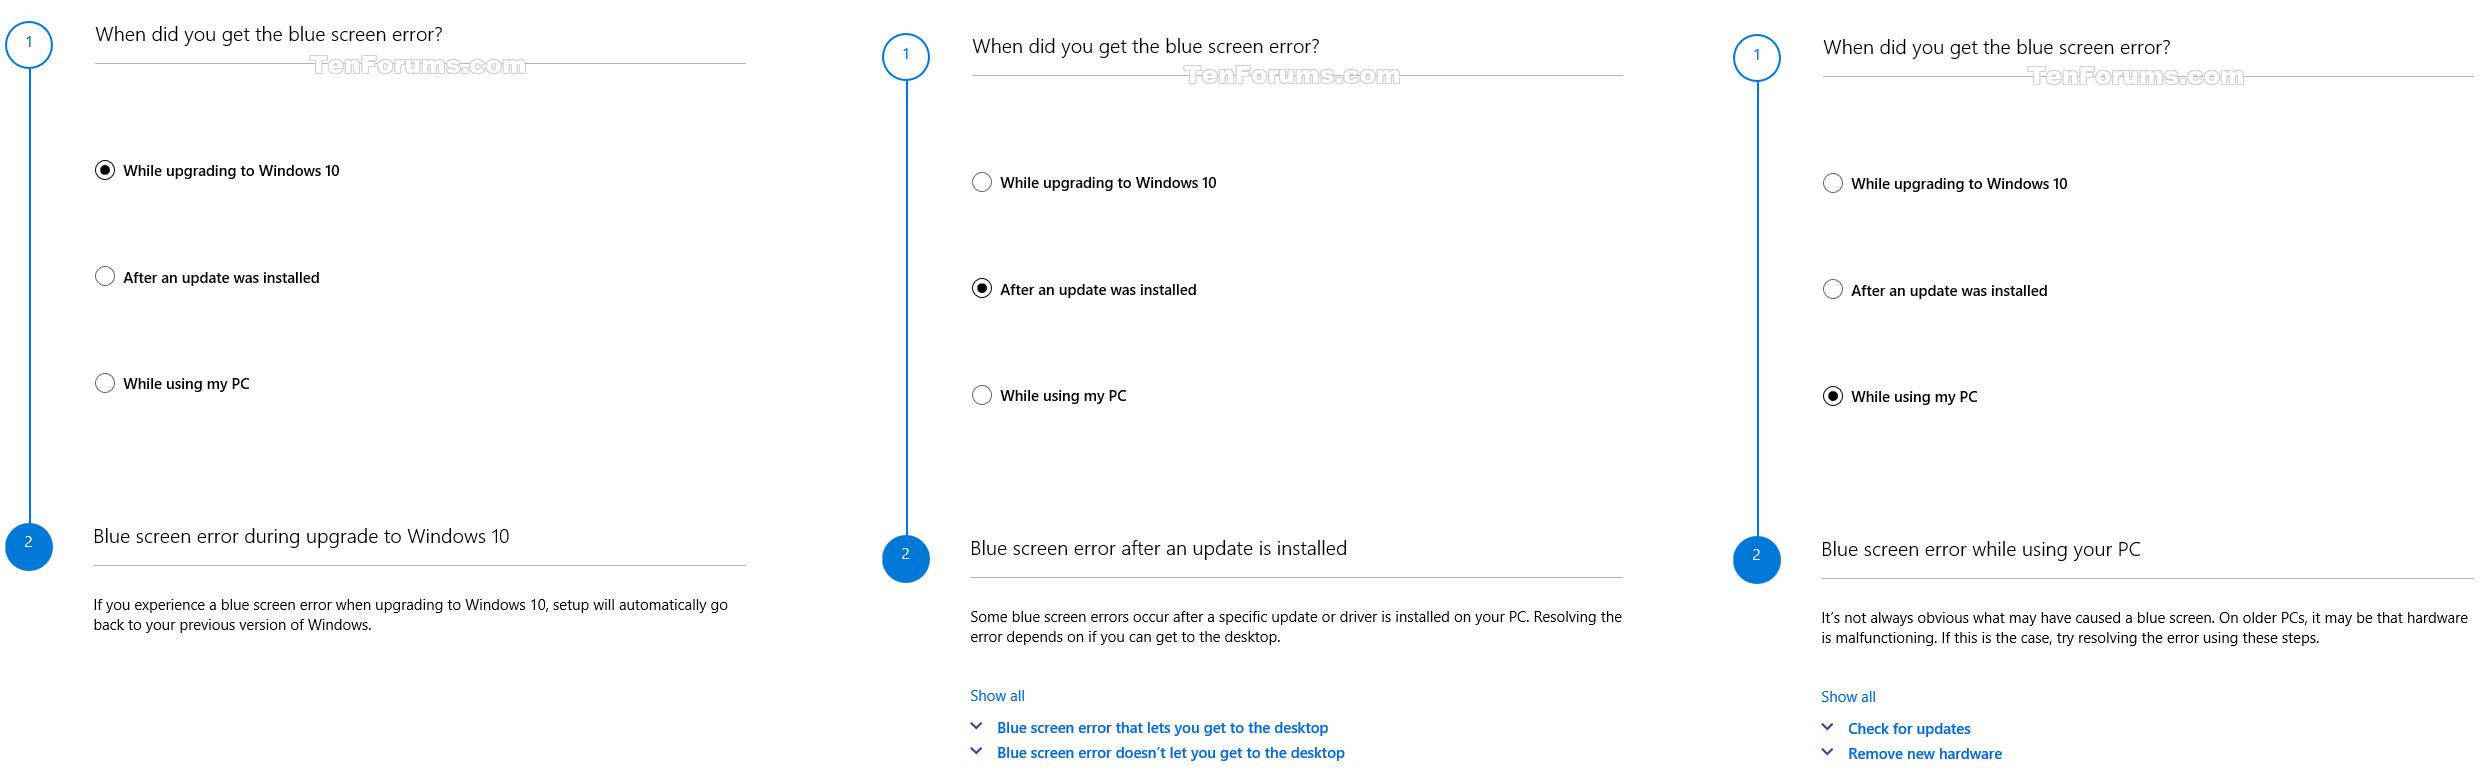 Run BSOD Error Troubleshooter in Windows 10 | Tutorials